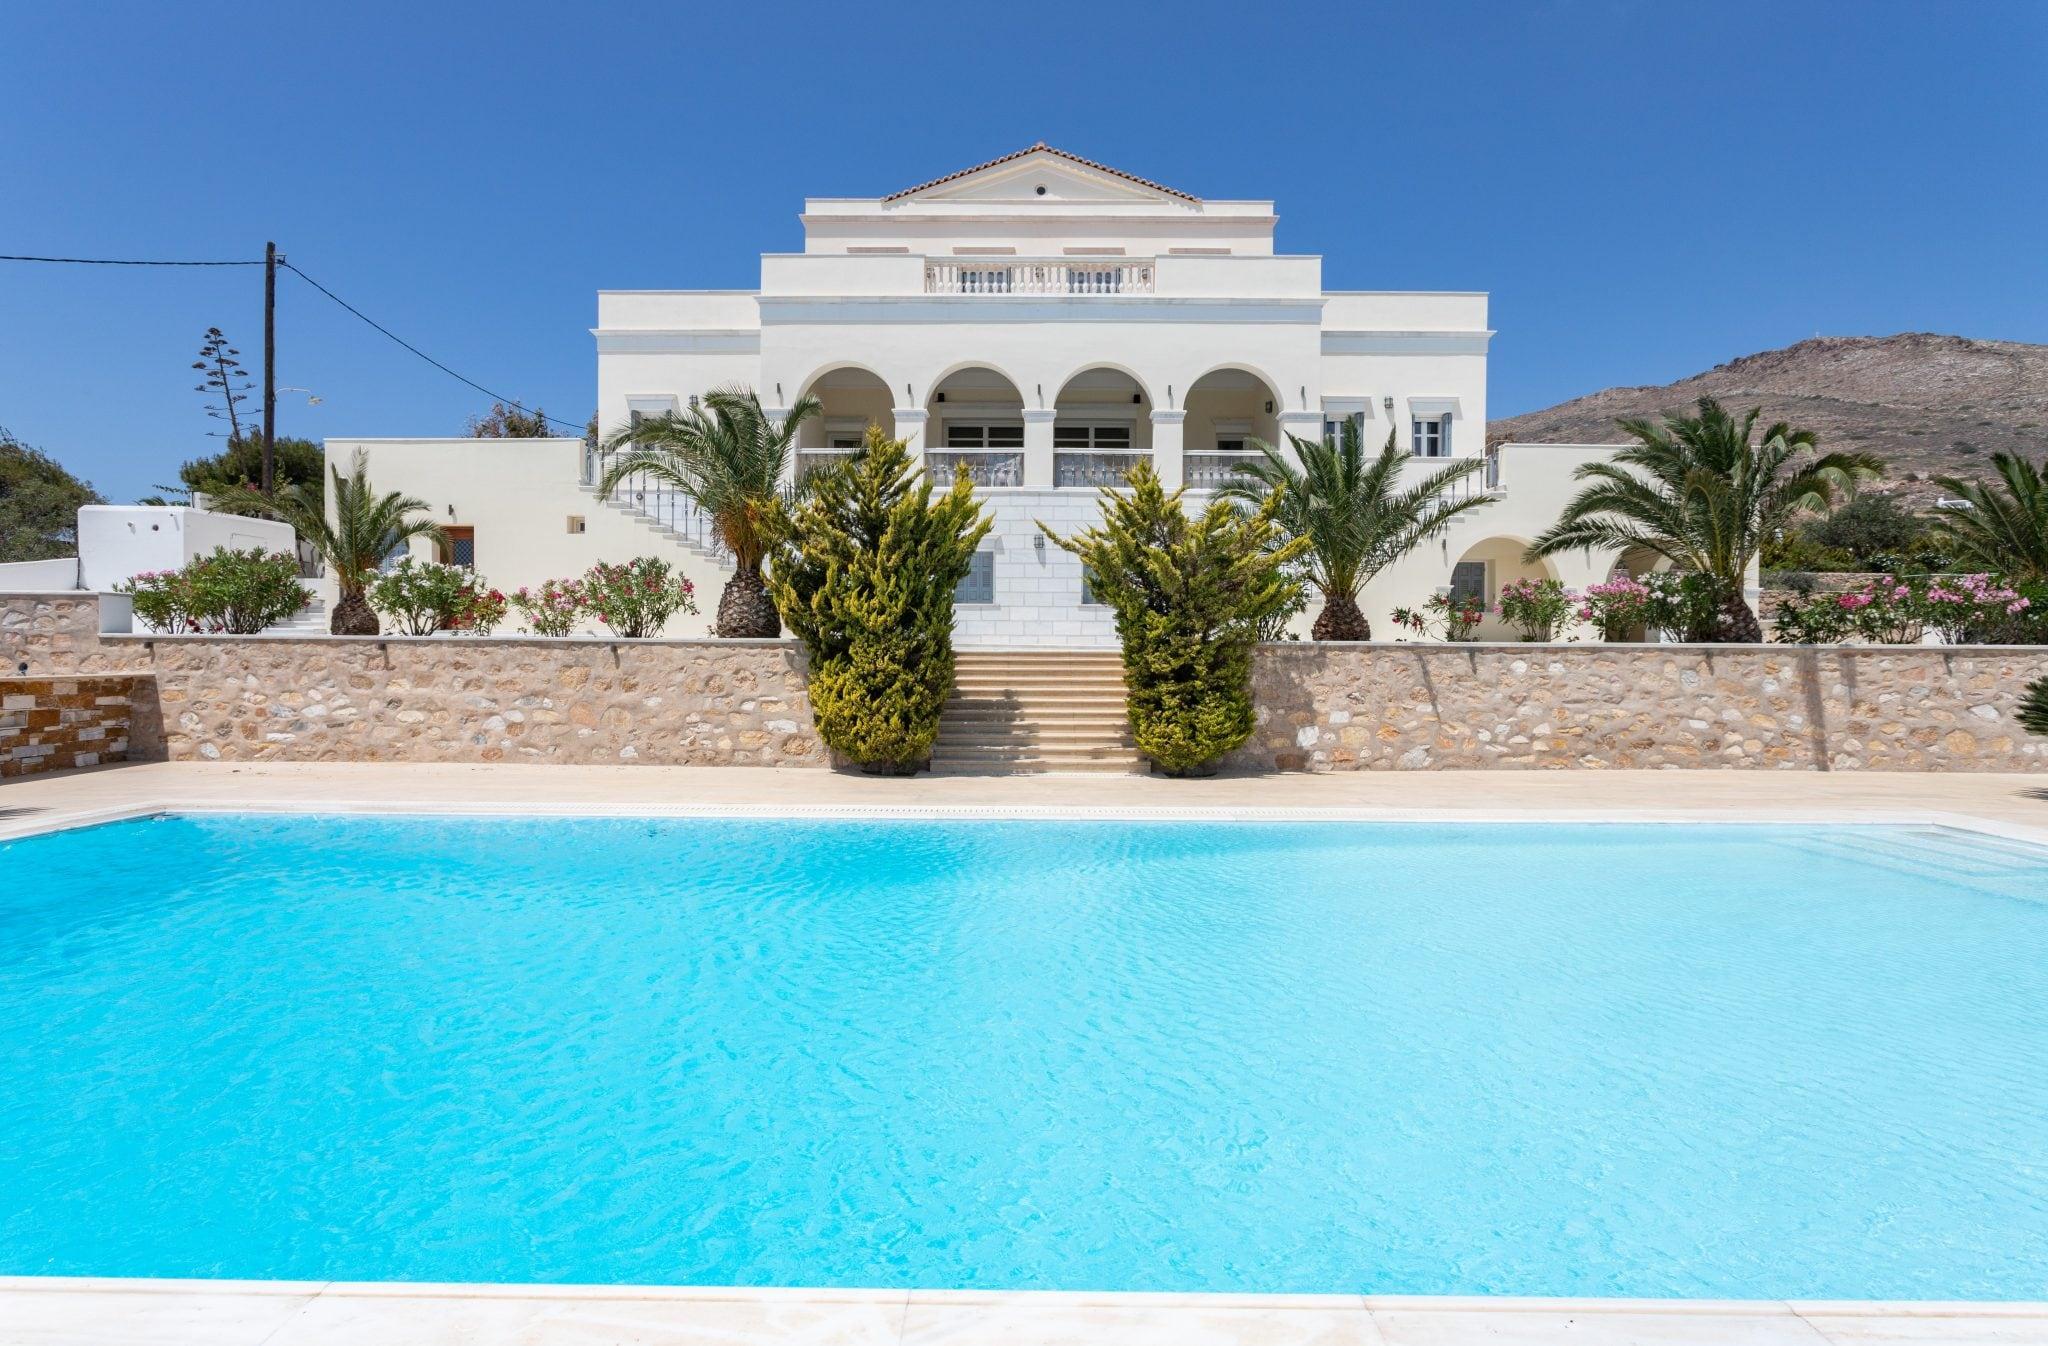 Maison, Syros - Ref GR-4546-S